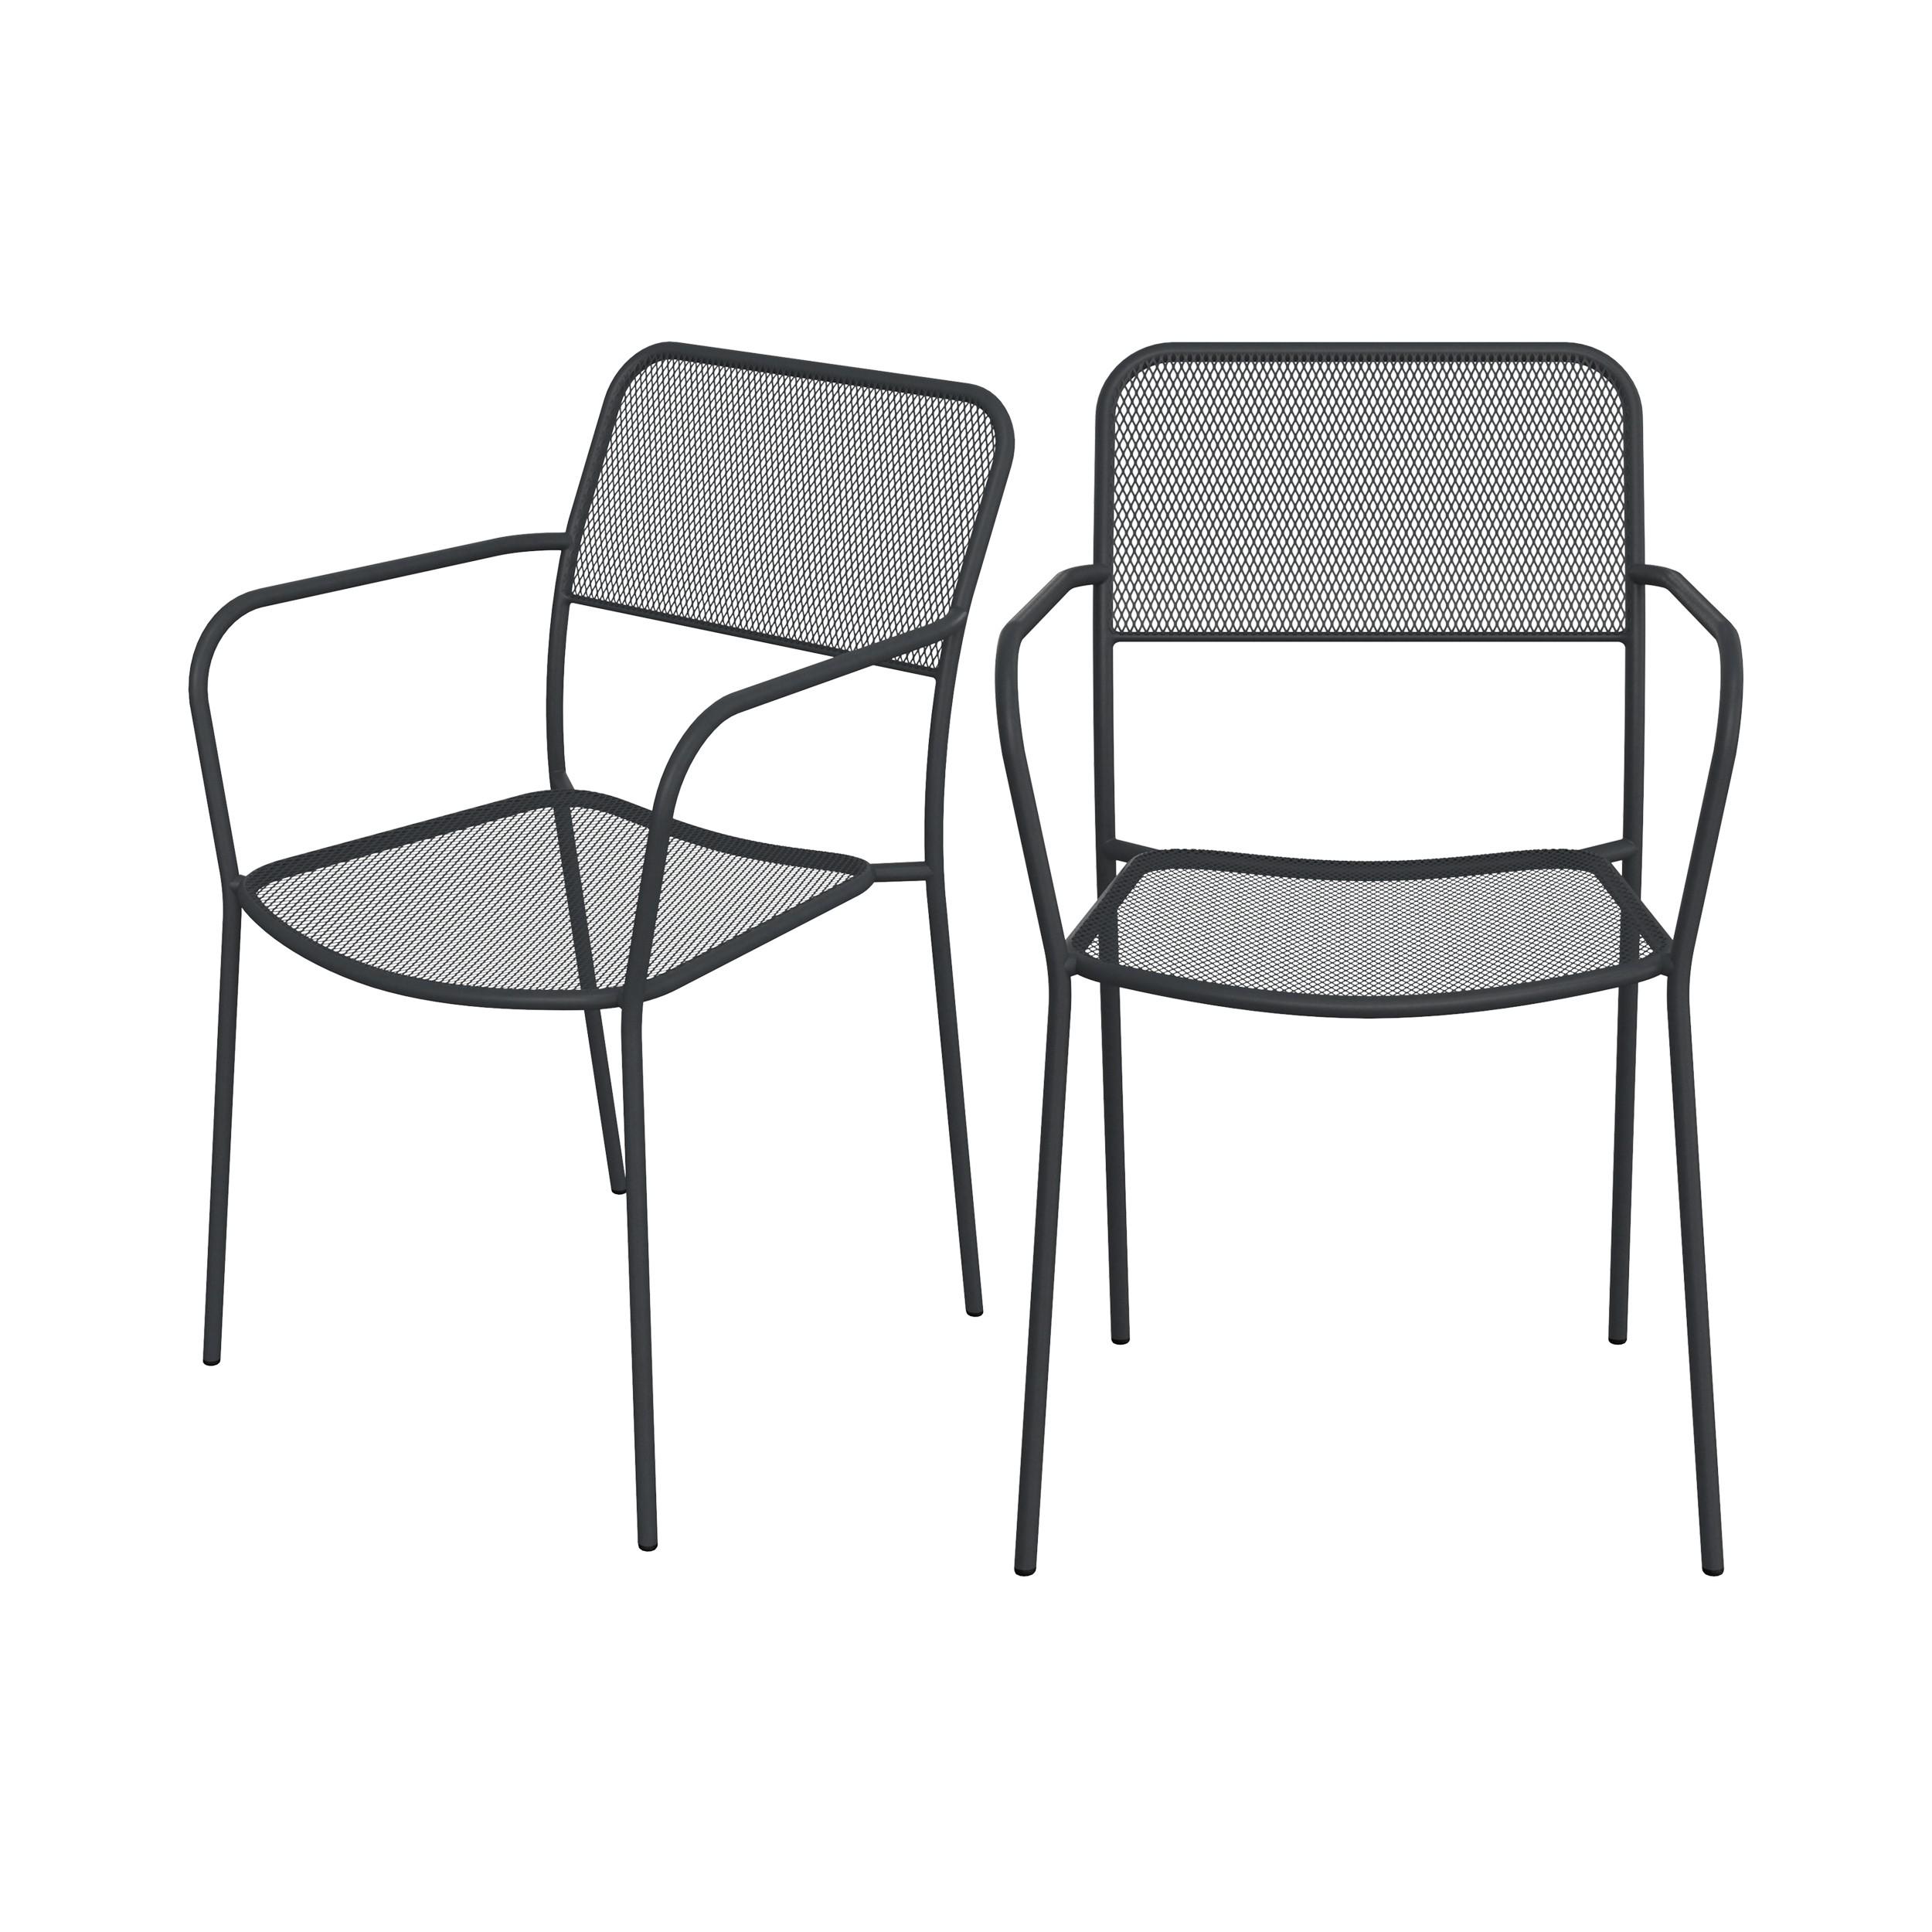 acheter chaise jardin exterieur metal design